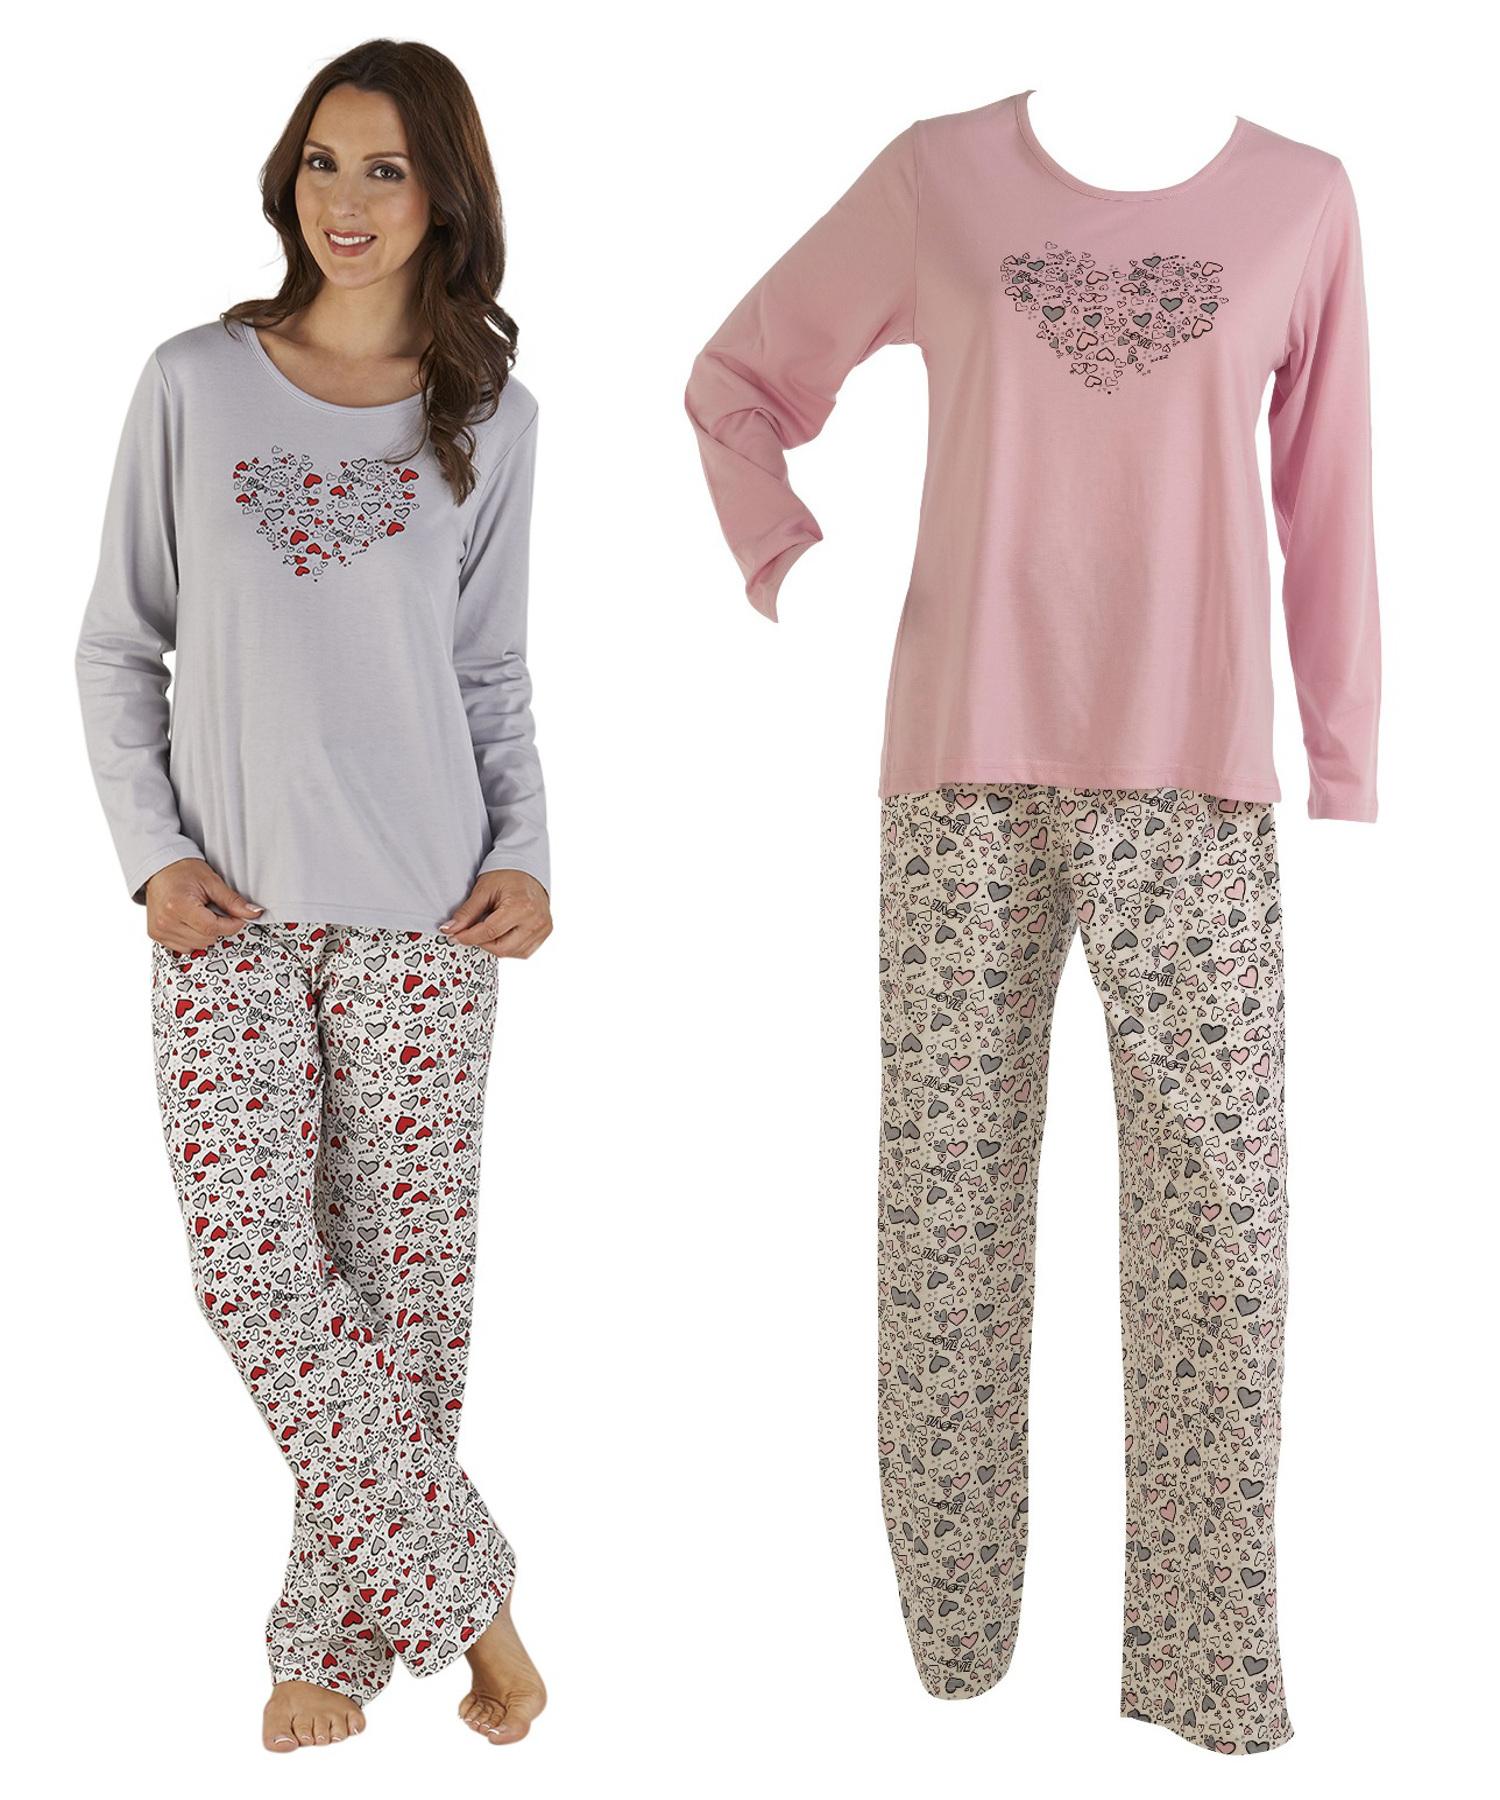 d3e715be89 Love Heart Print Ladies PJs Set Slenderella Gaspe Polycotton Nightwear  Pyjamas. Smiley face. These ladies soft jersey pyjama sets have a fun heart  pattern ...